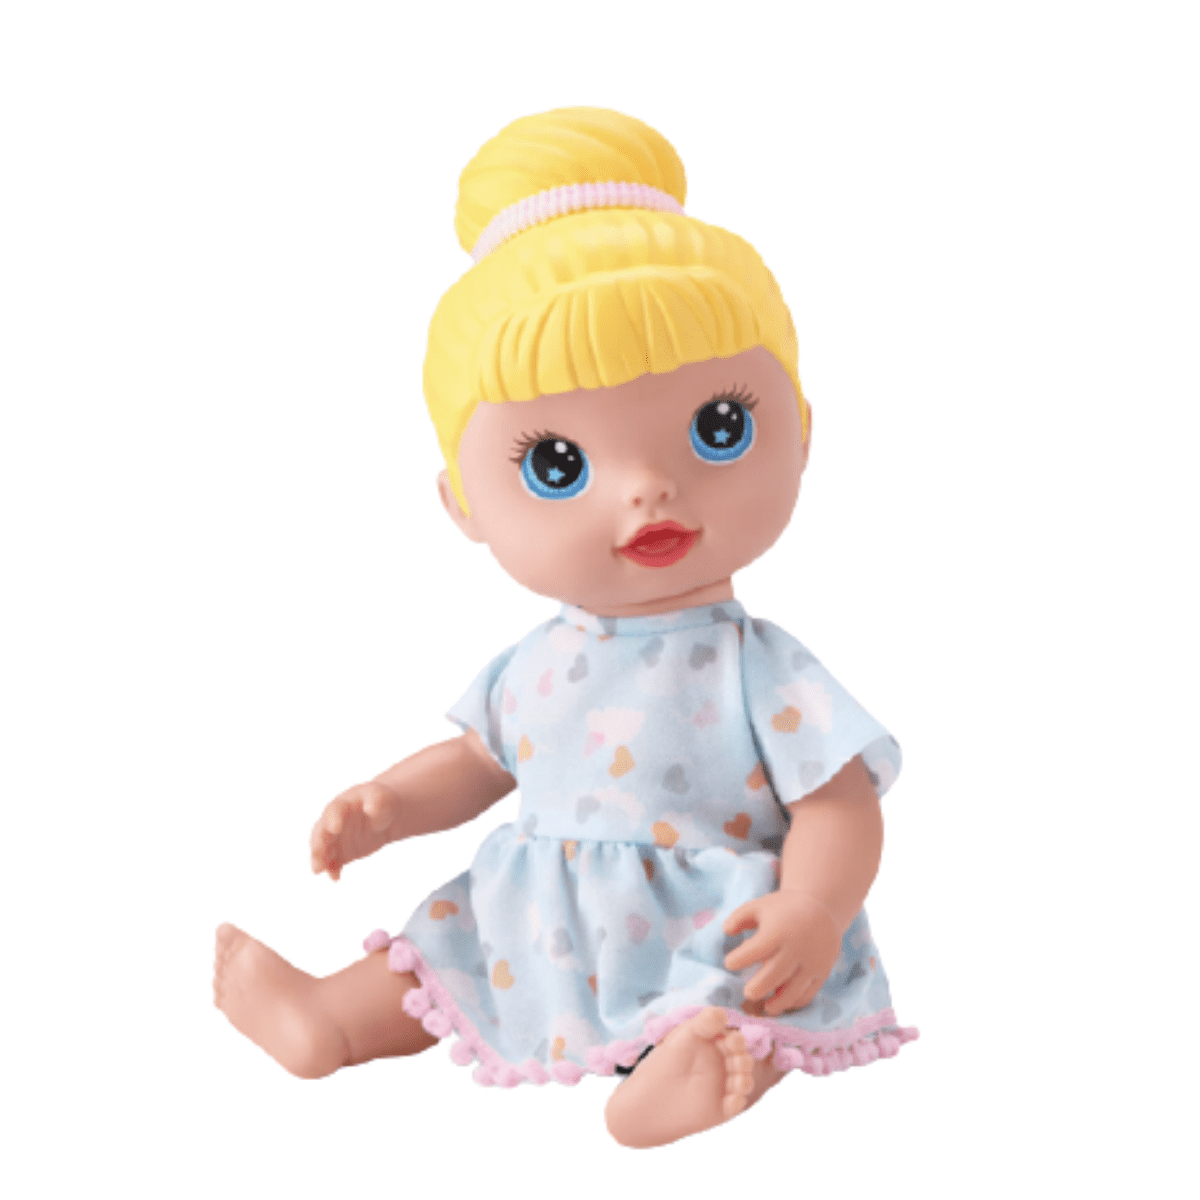 Boneca Buddies Doutora - Bambola